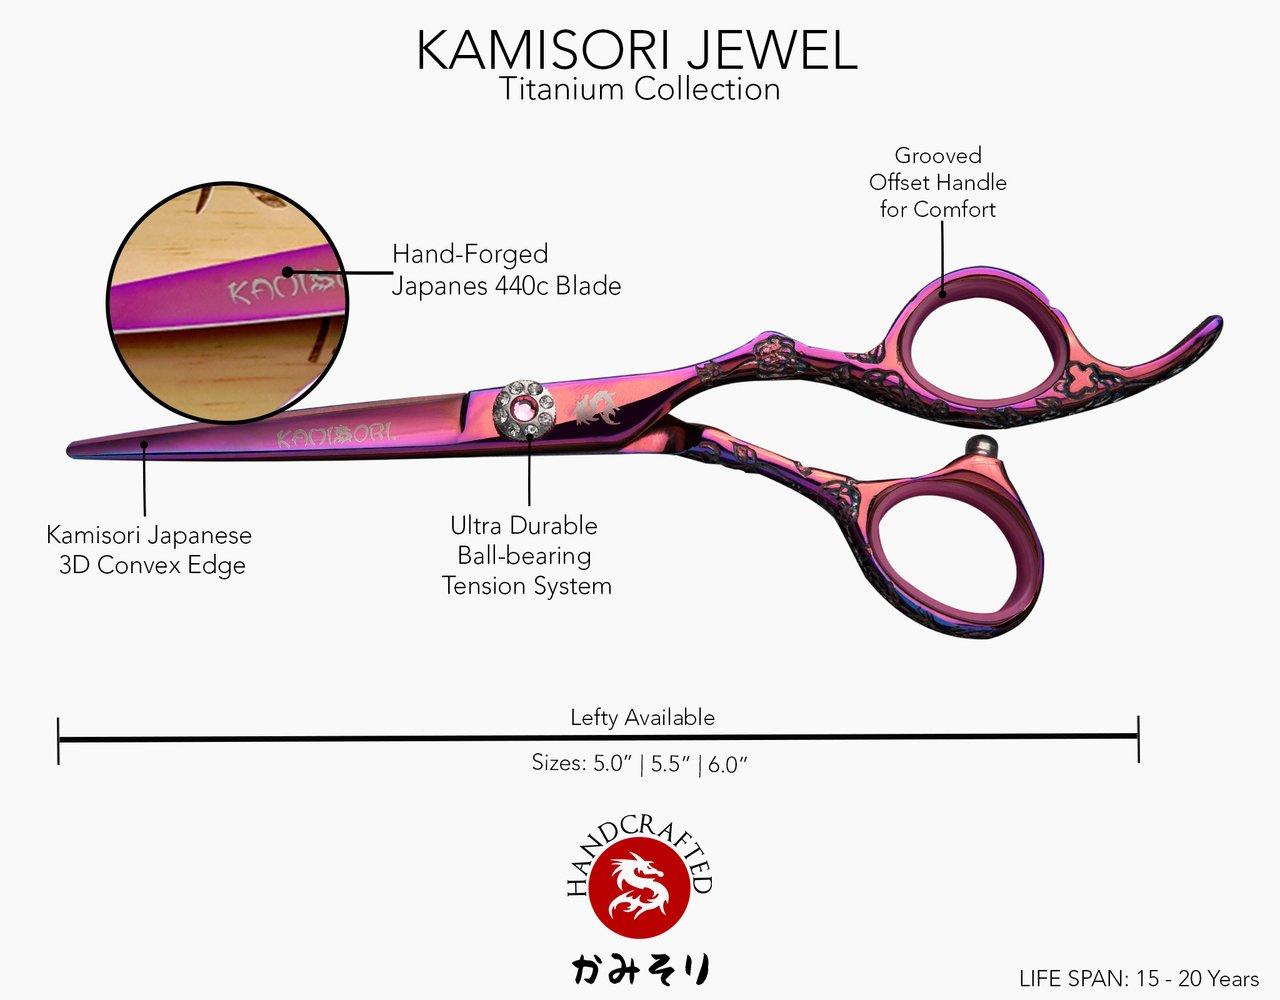 Kamisori Jewel 5.5'' Hair Cutting Shear / Scissor (HE-3) - Authorized Distributor by Kamisori (Image #2)